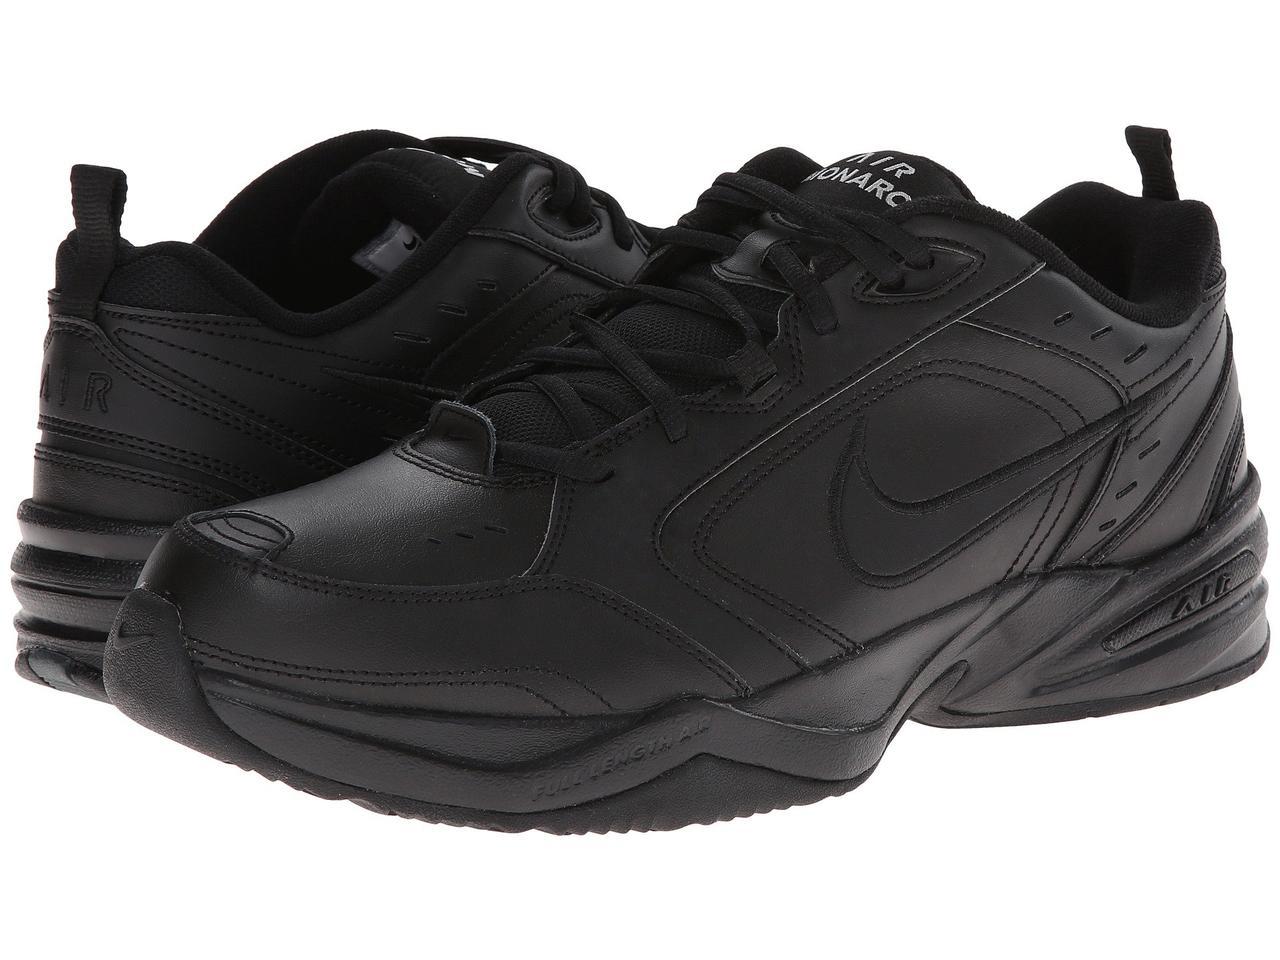 b4c4d84e Кроссовки/Кеды (Оригинал) Nike Air Monarch IV Black/Black, цена 2 ...